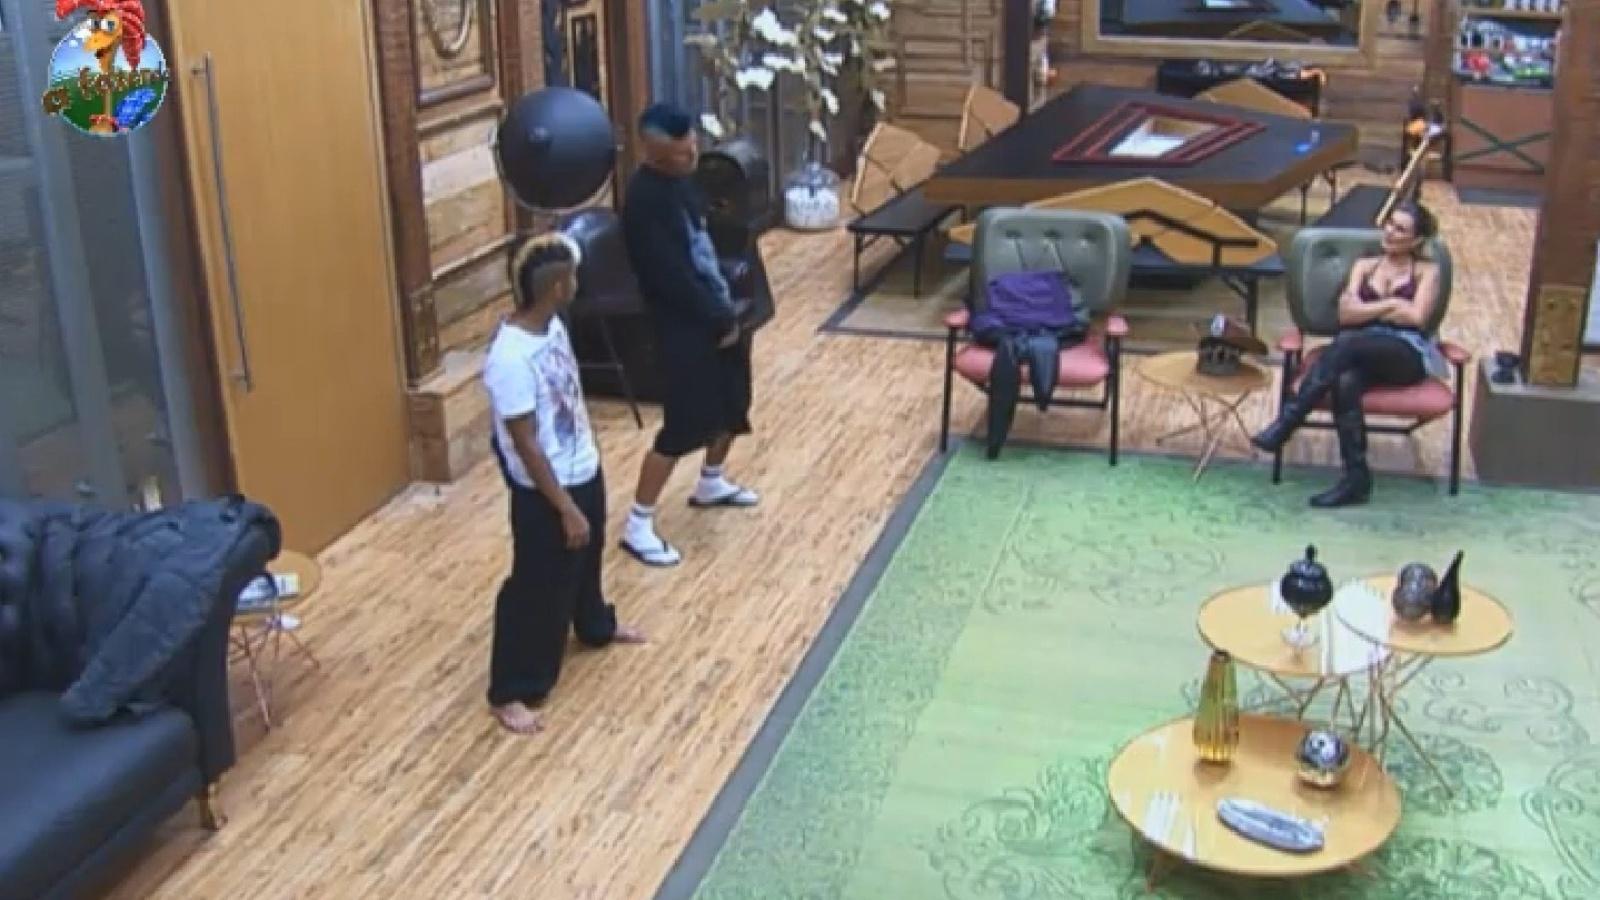 9.ago.2013 - Yudi ensina passos de dança para Mateus